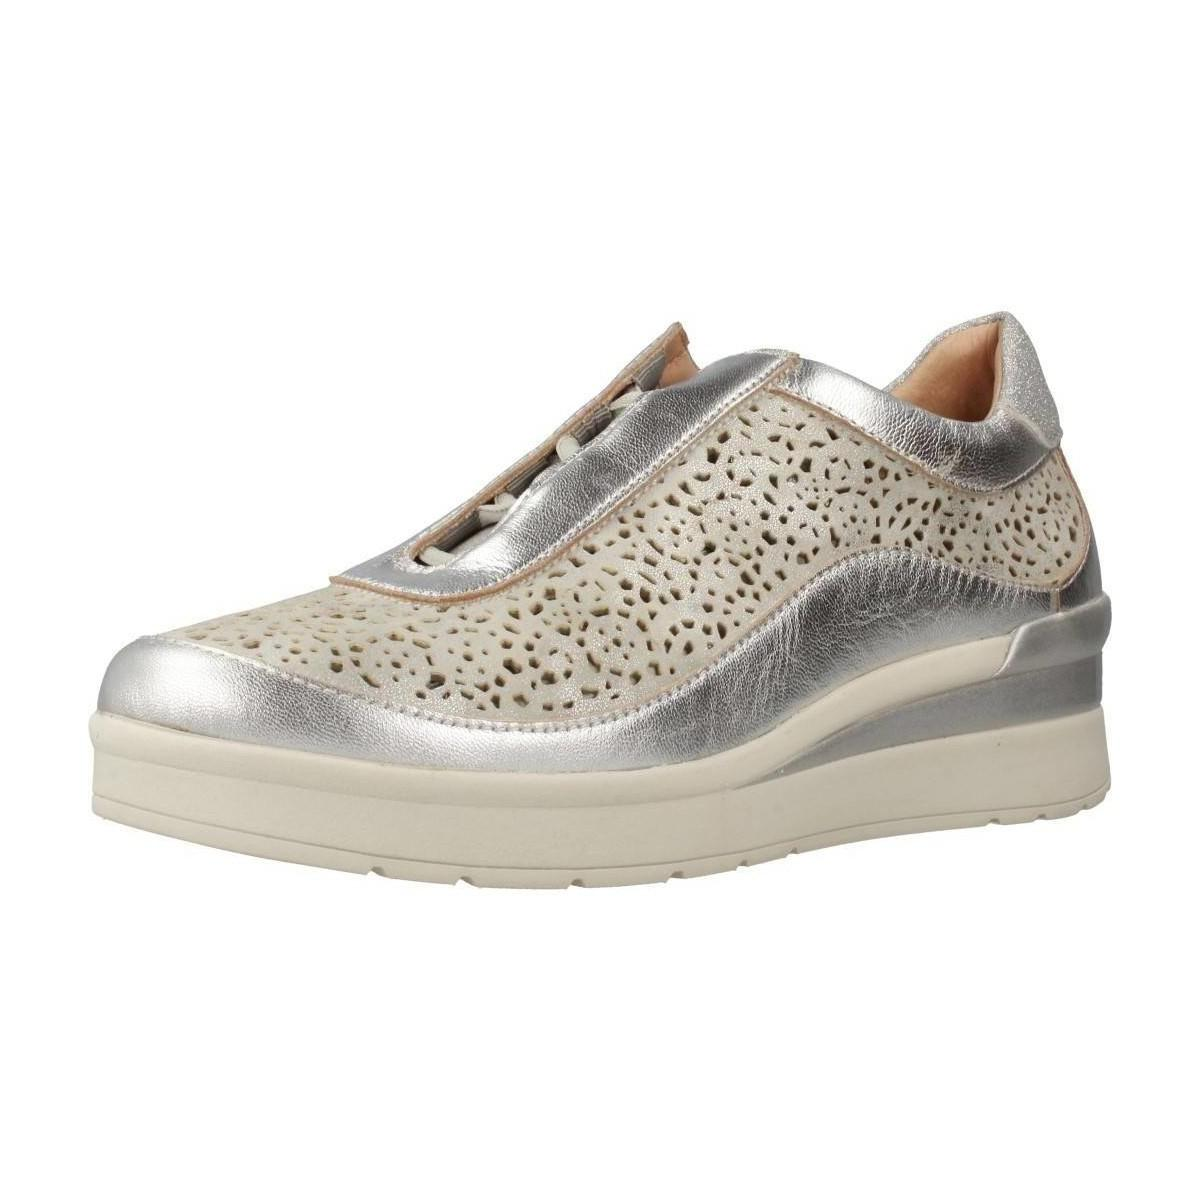 Stonefly - Damen - Cream 2 bis - Sneaker - silber gxIUEI4